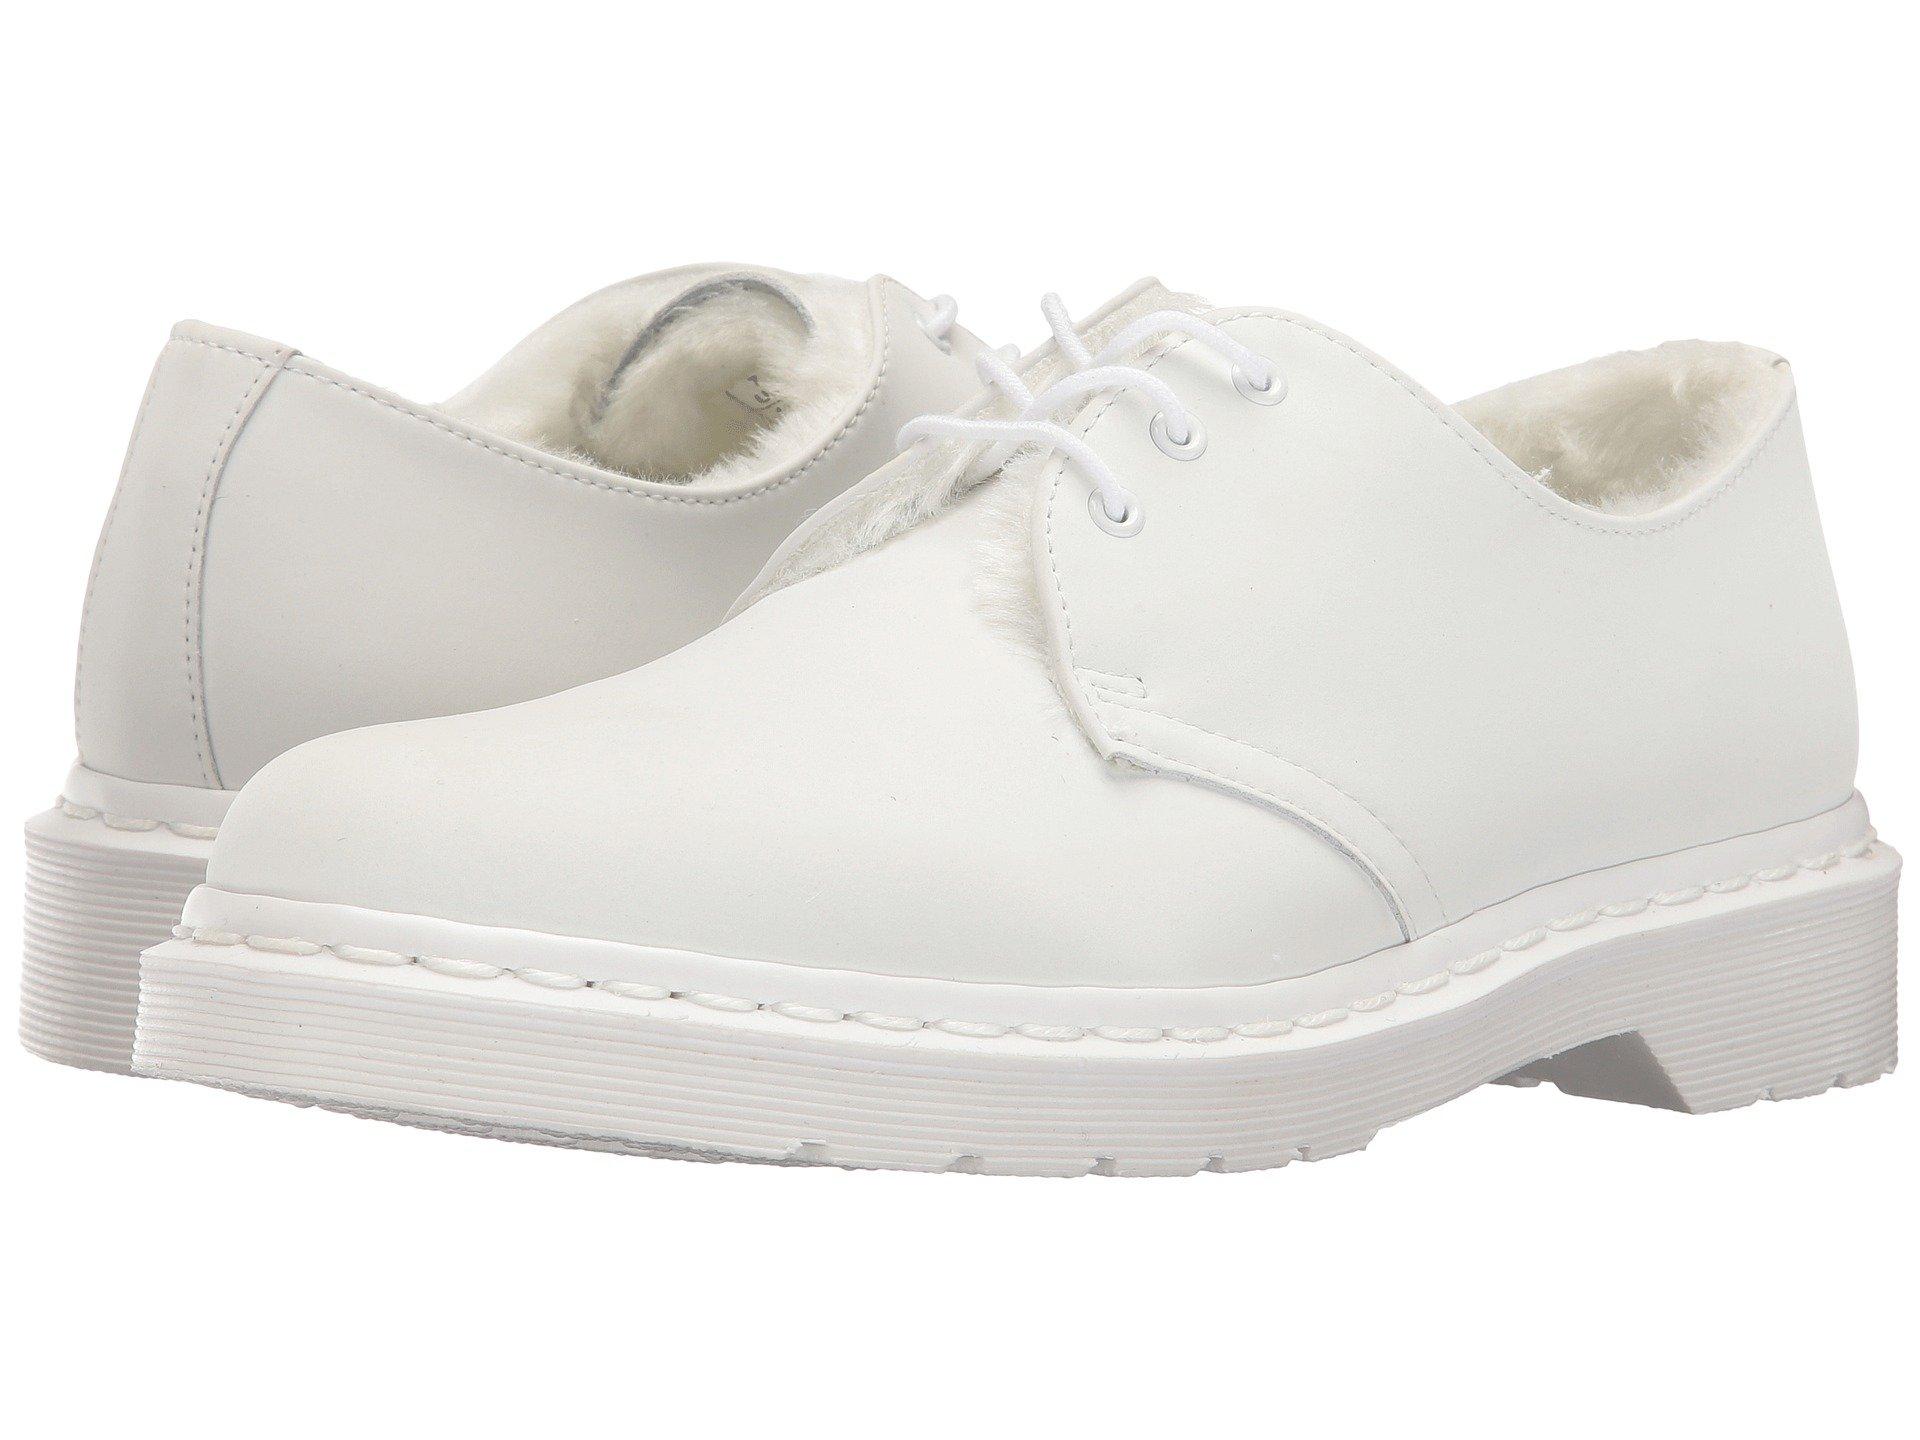 Zapato Casual para Mujer Dr. Martens 1461 FL 3-Eye Shoe  + Dr. Martens en VeoyCompro.net